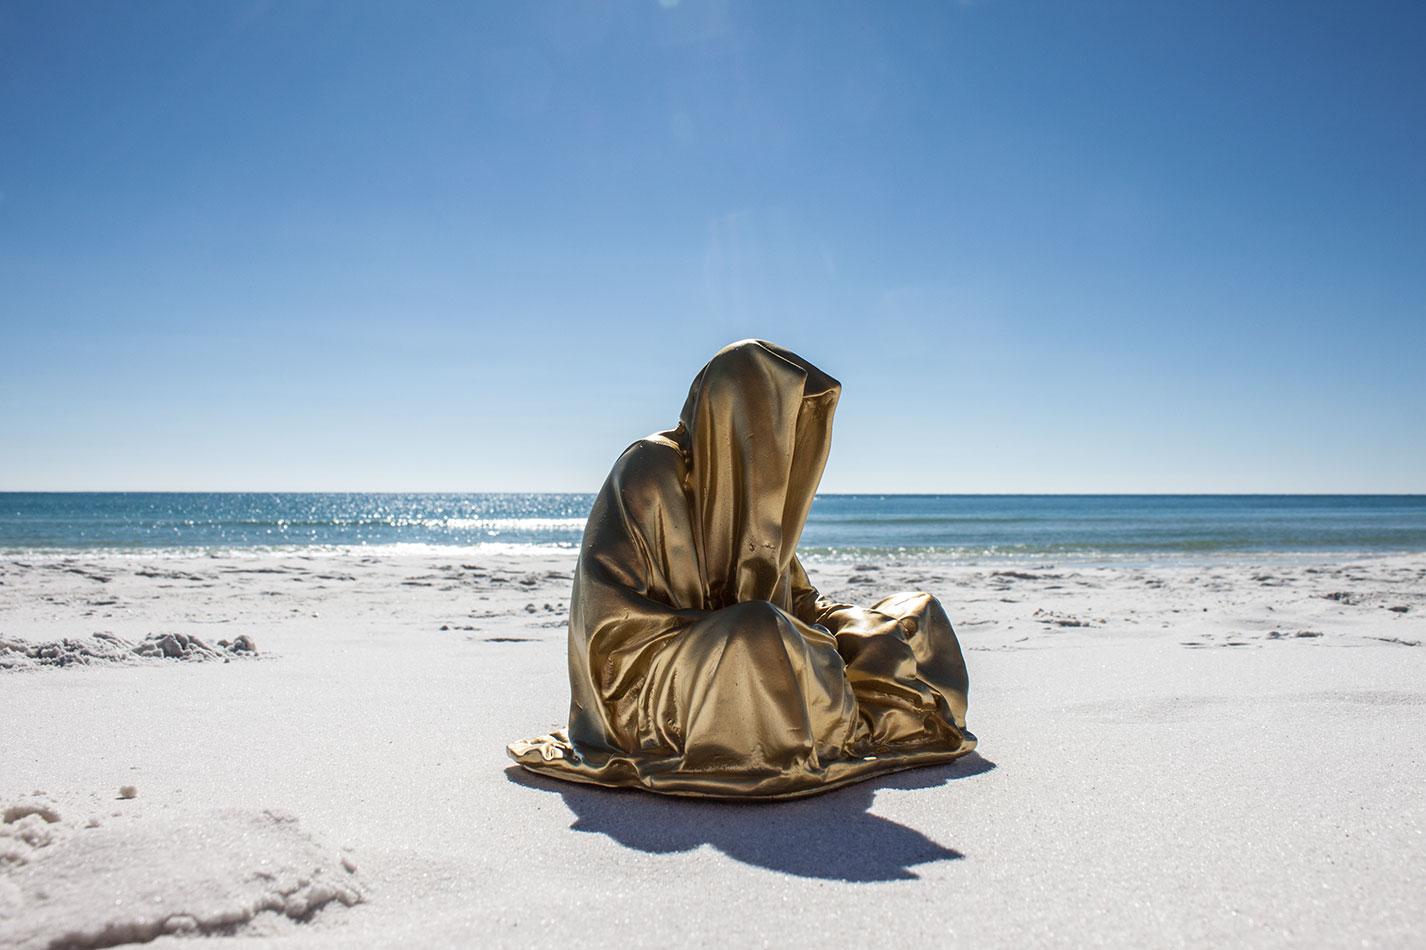 art-basel-miami-beach-fair-usa-florida-guardians-of-time-manfred-kili-kielnhofer-contemporary-fine-art-modern-arts-design-antiques-sculpture-5468